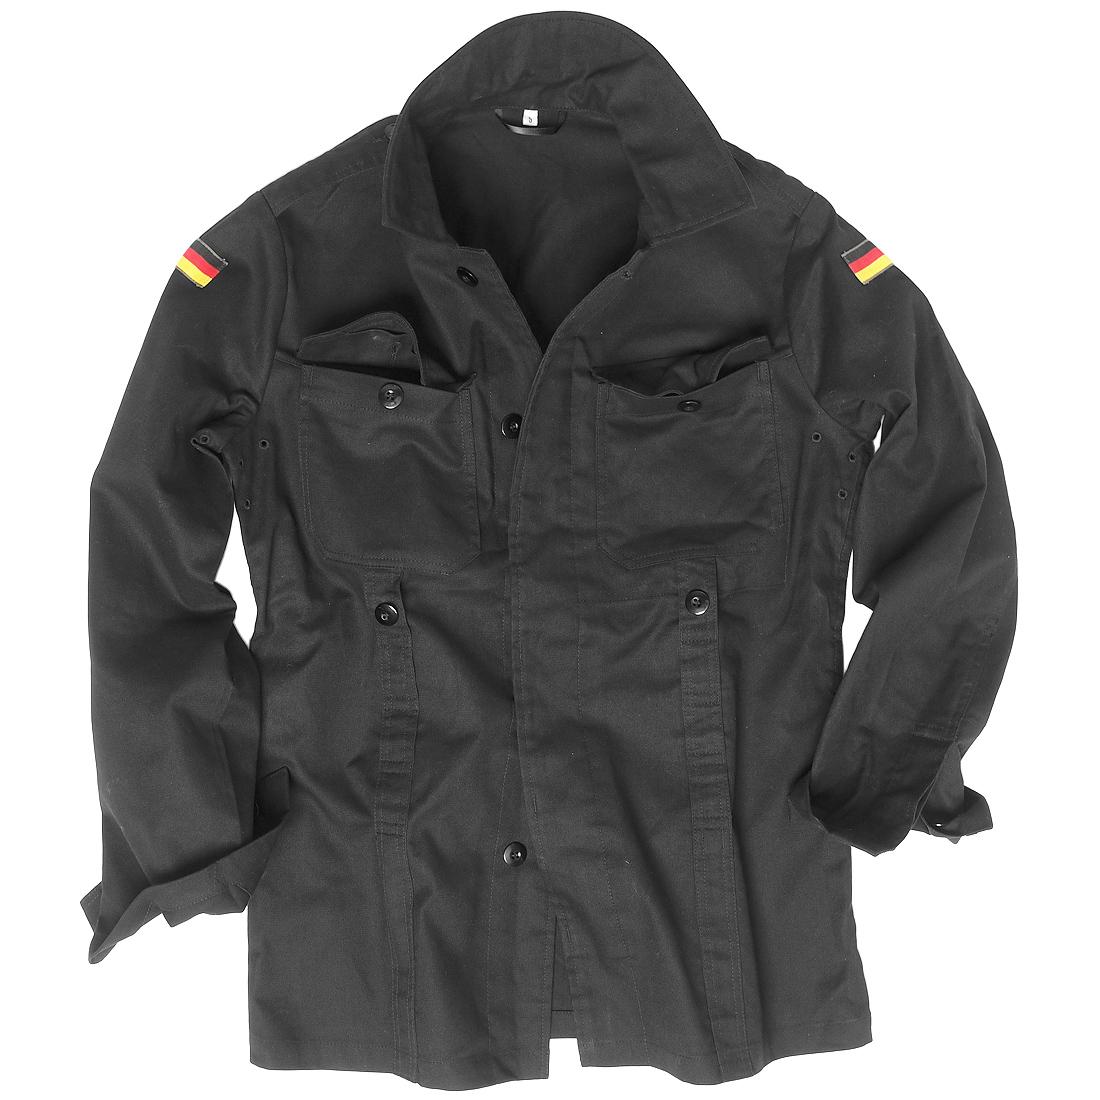 Mil-Tec BW German Army Moleskin Jacket Military Mens Security ...